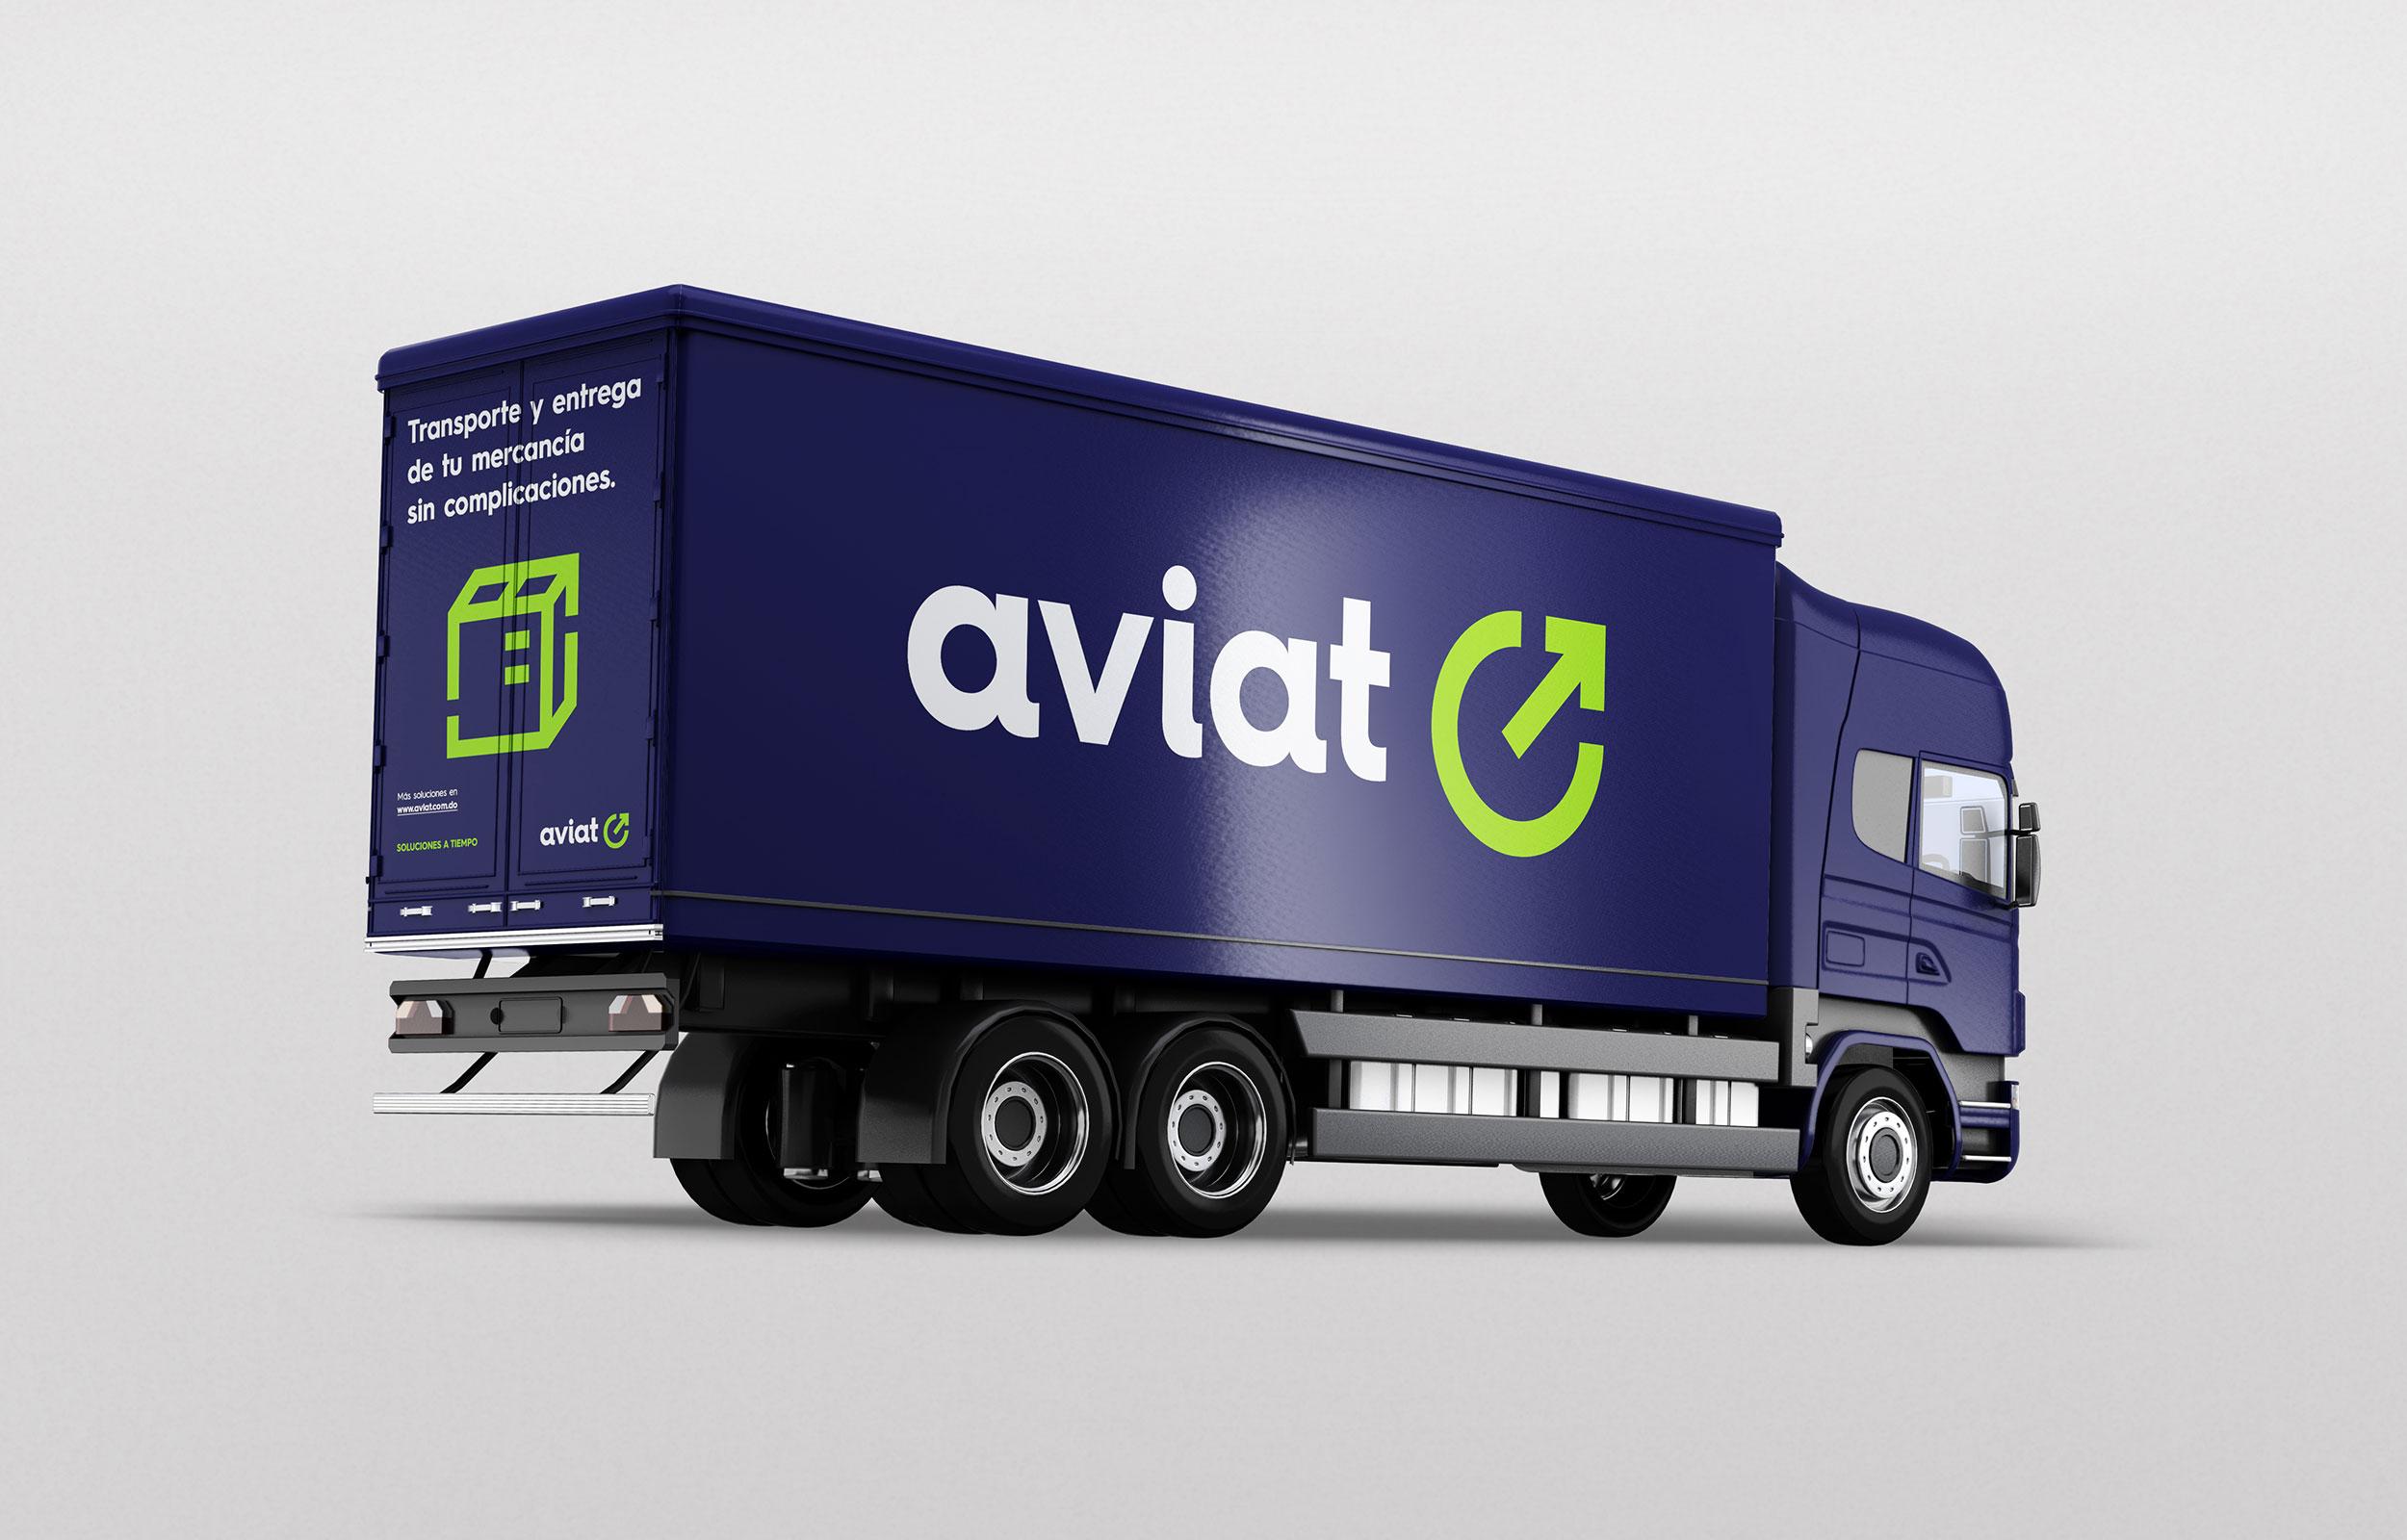 Diferente_Aviat_Truck_HR